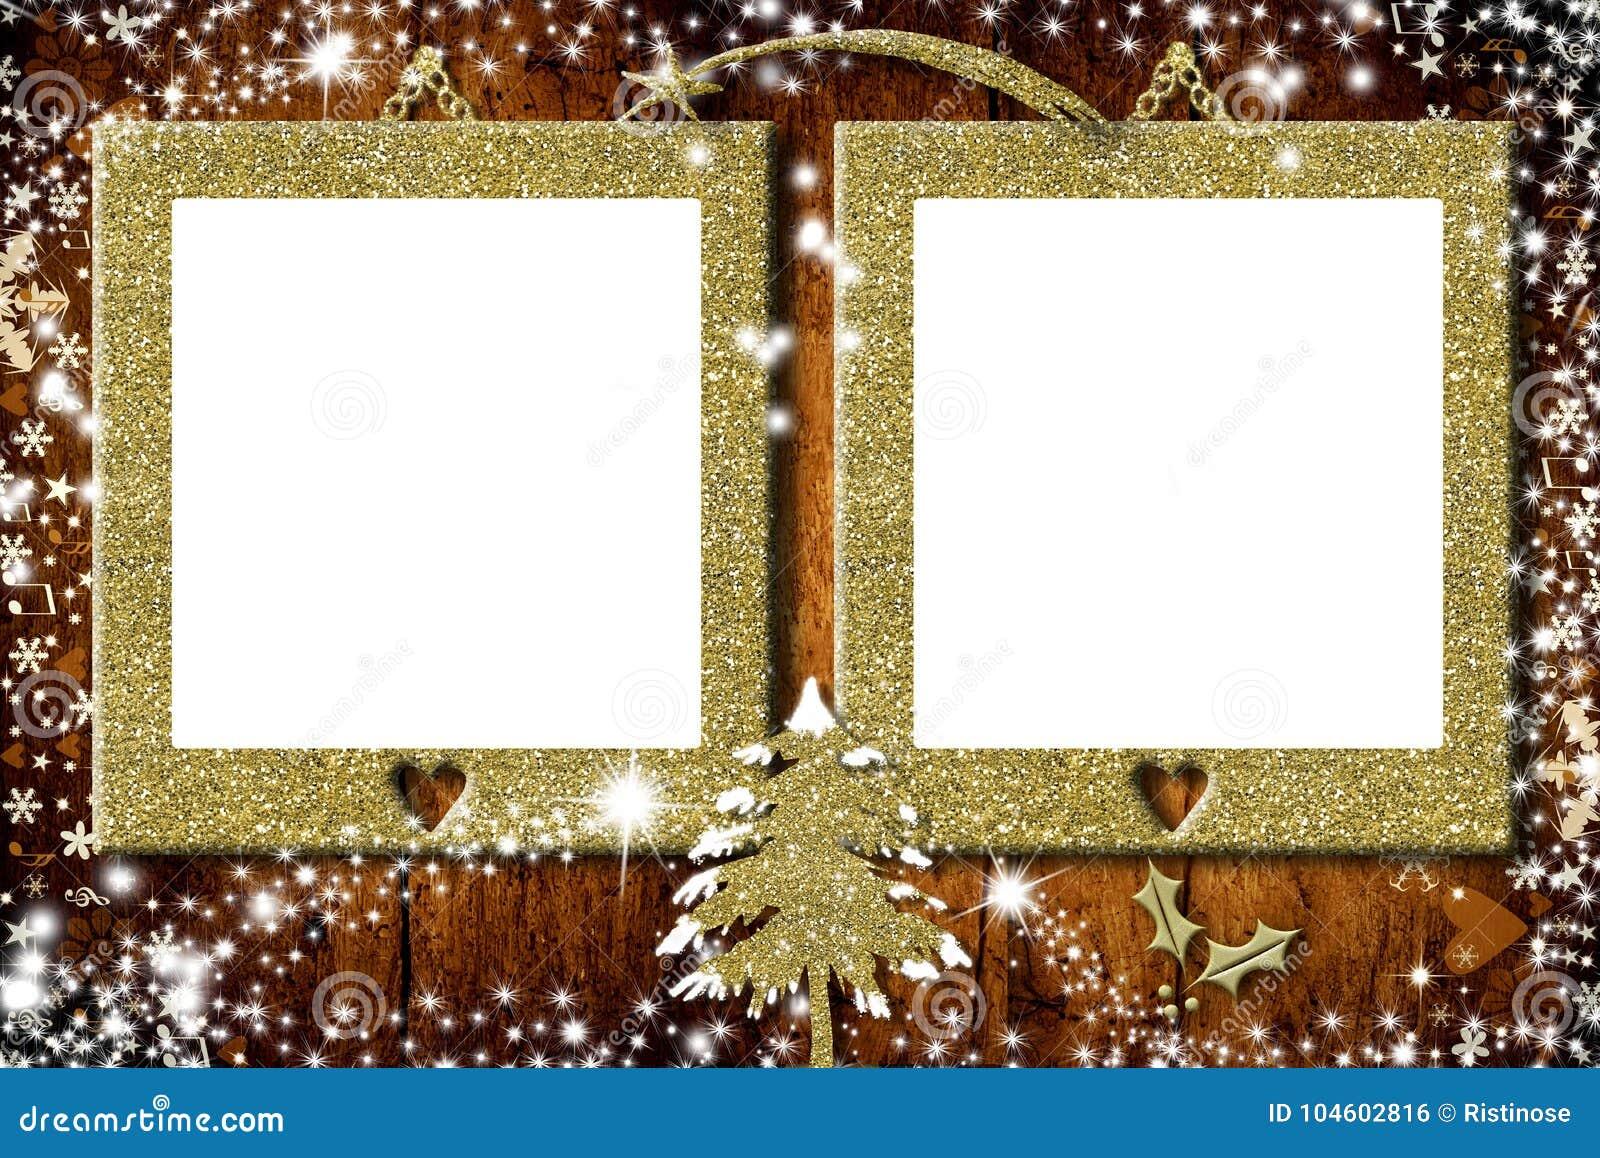 Two Photo Frames Christmas Cards Stock Illustration Illustration